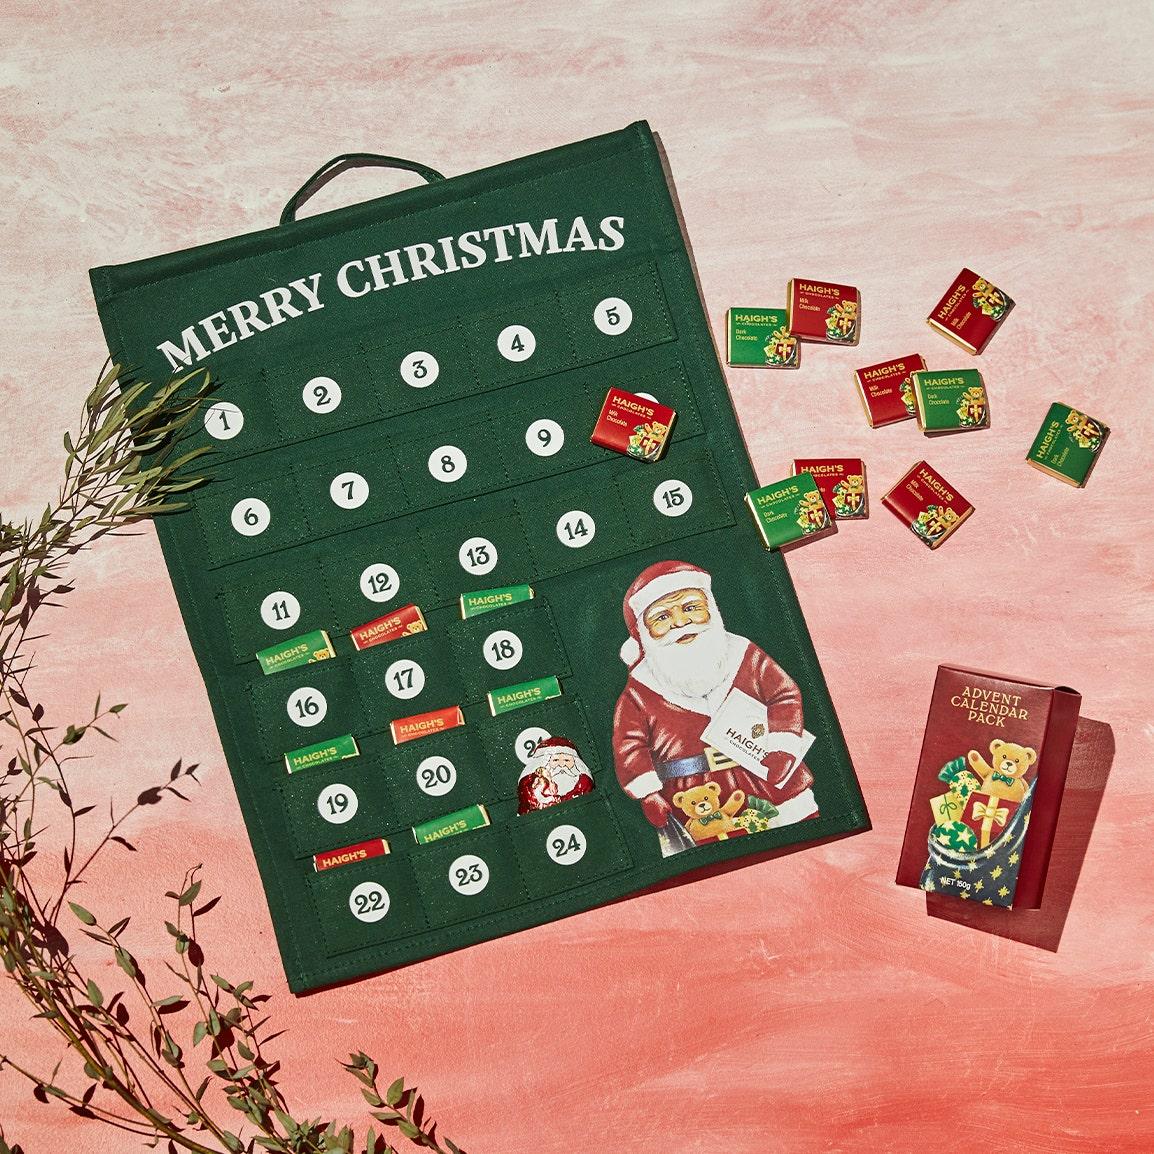 The chocolates lovers Advent Calendar